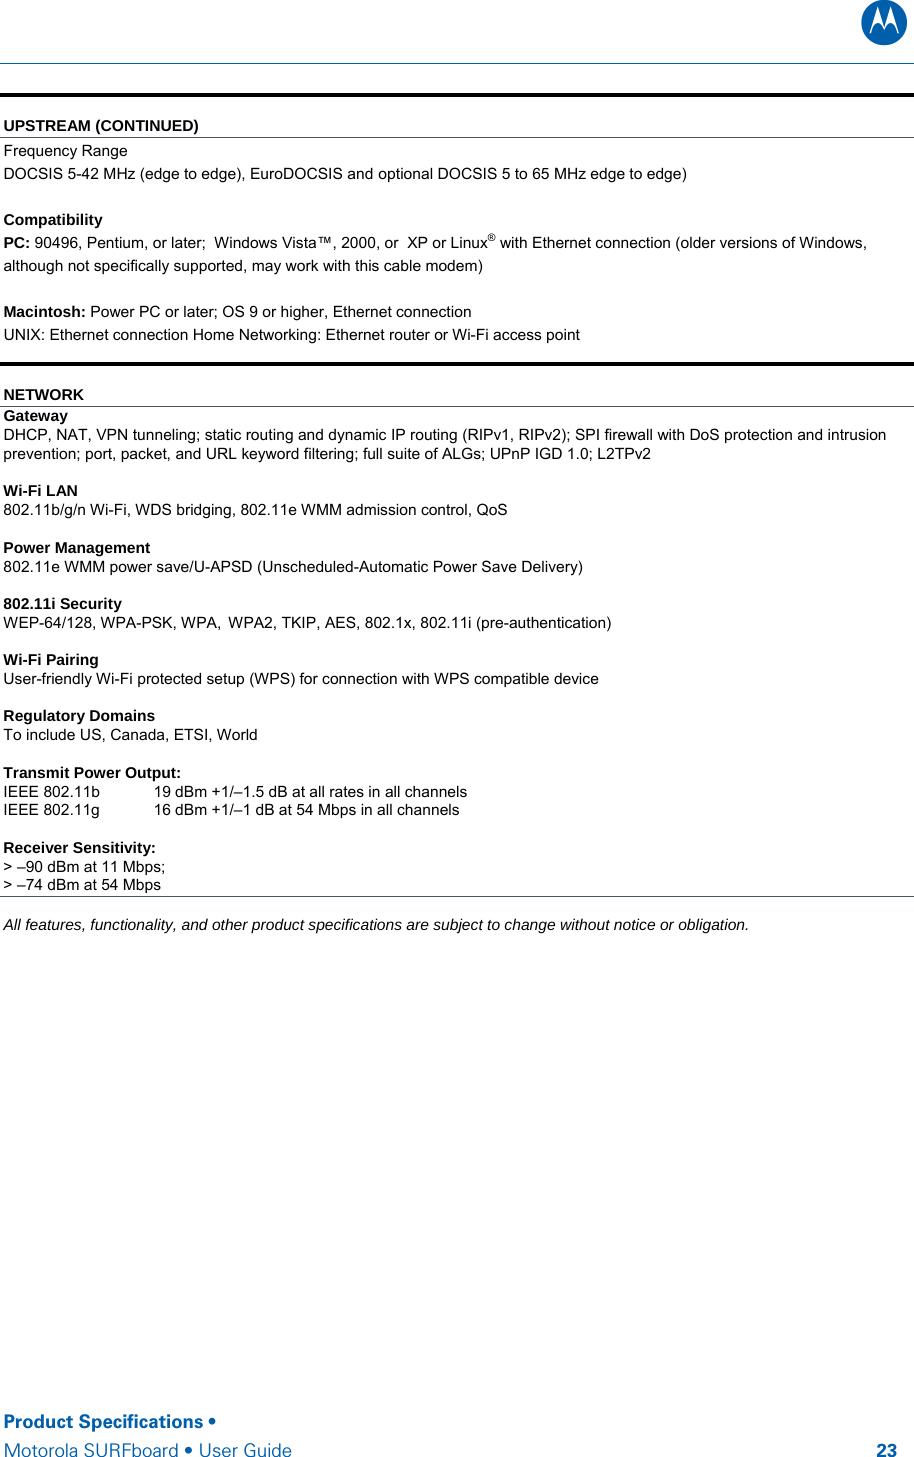 Arris Sbg6580 G228 Docsis 3 0 Wi Fi Gateway User Manual